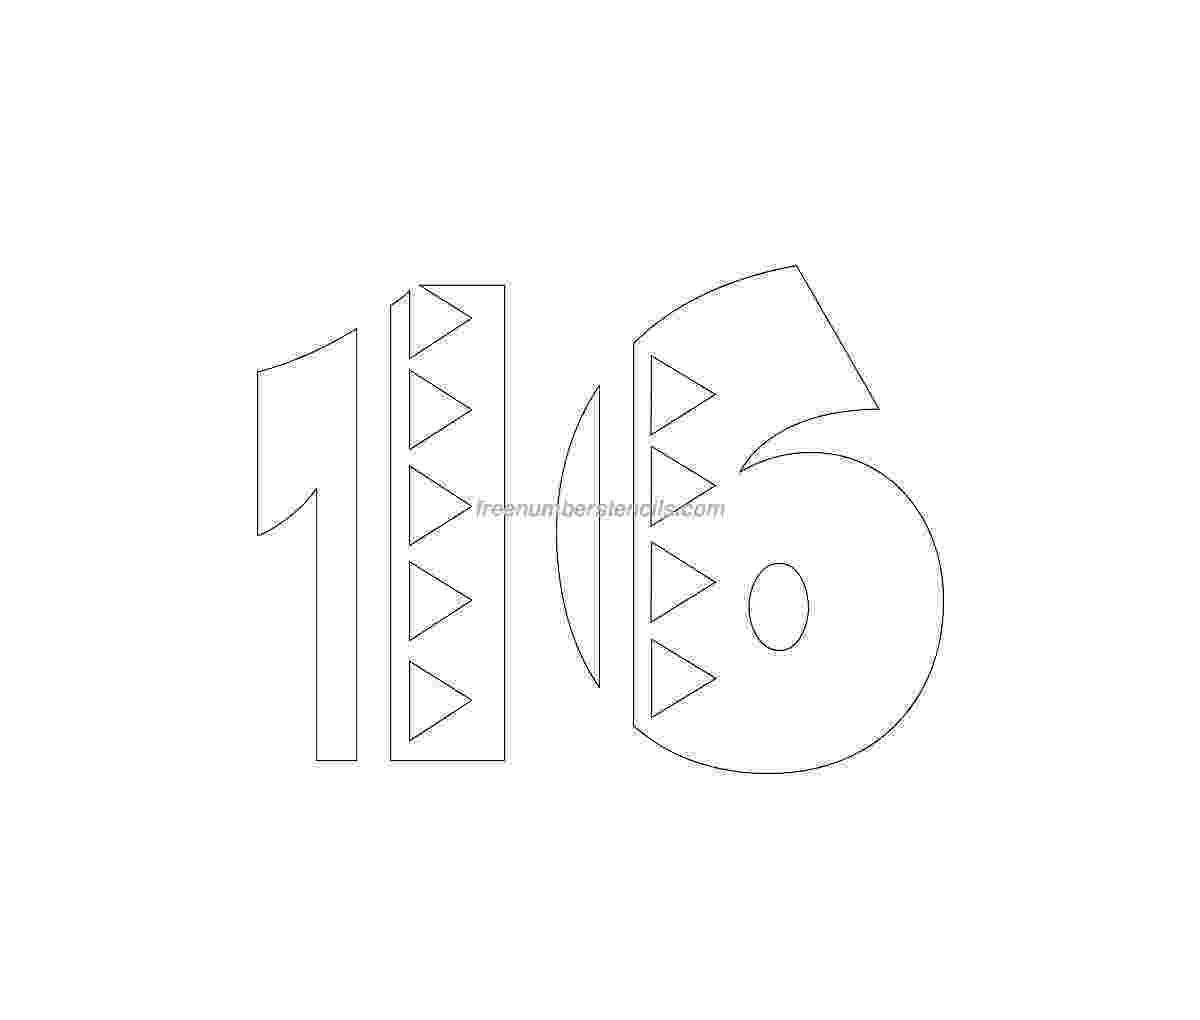 number 16 template number 16 template gallery 16 number template